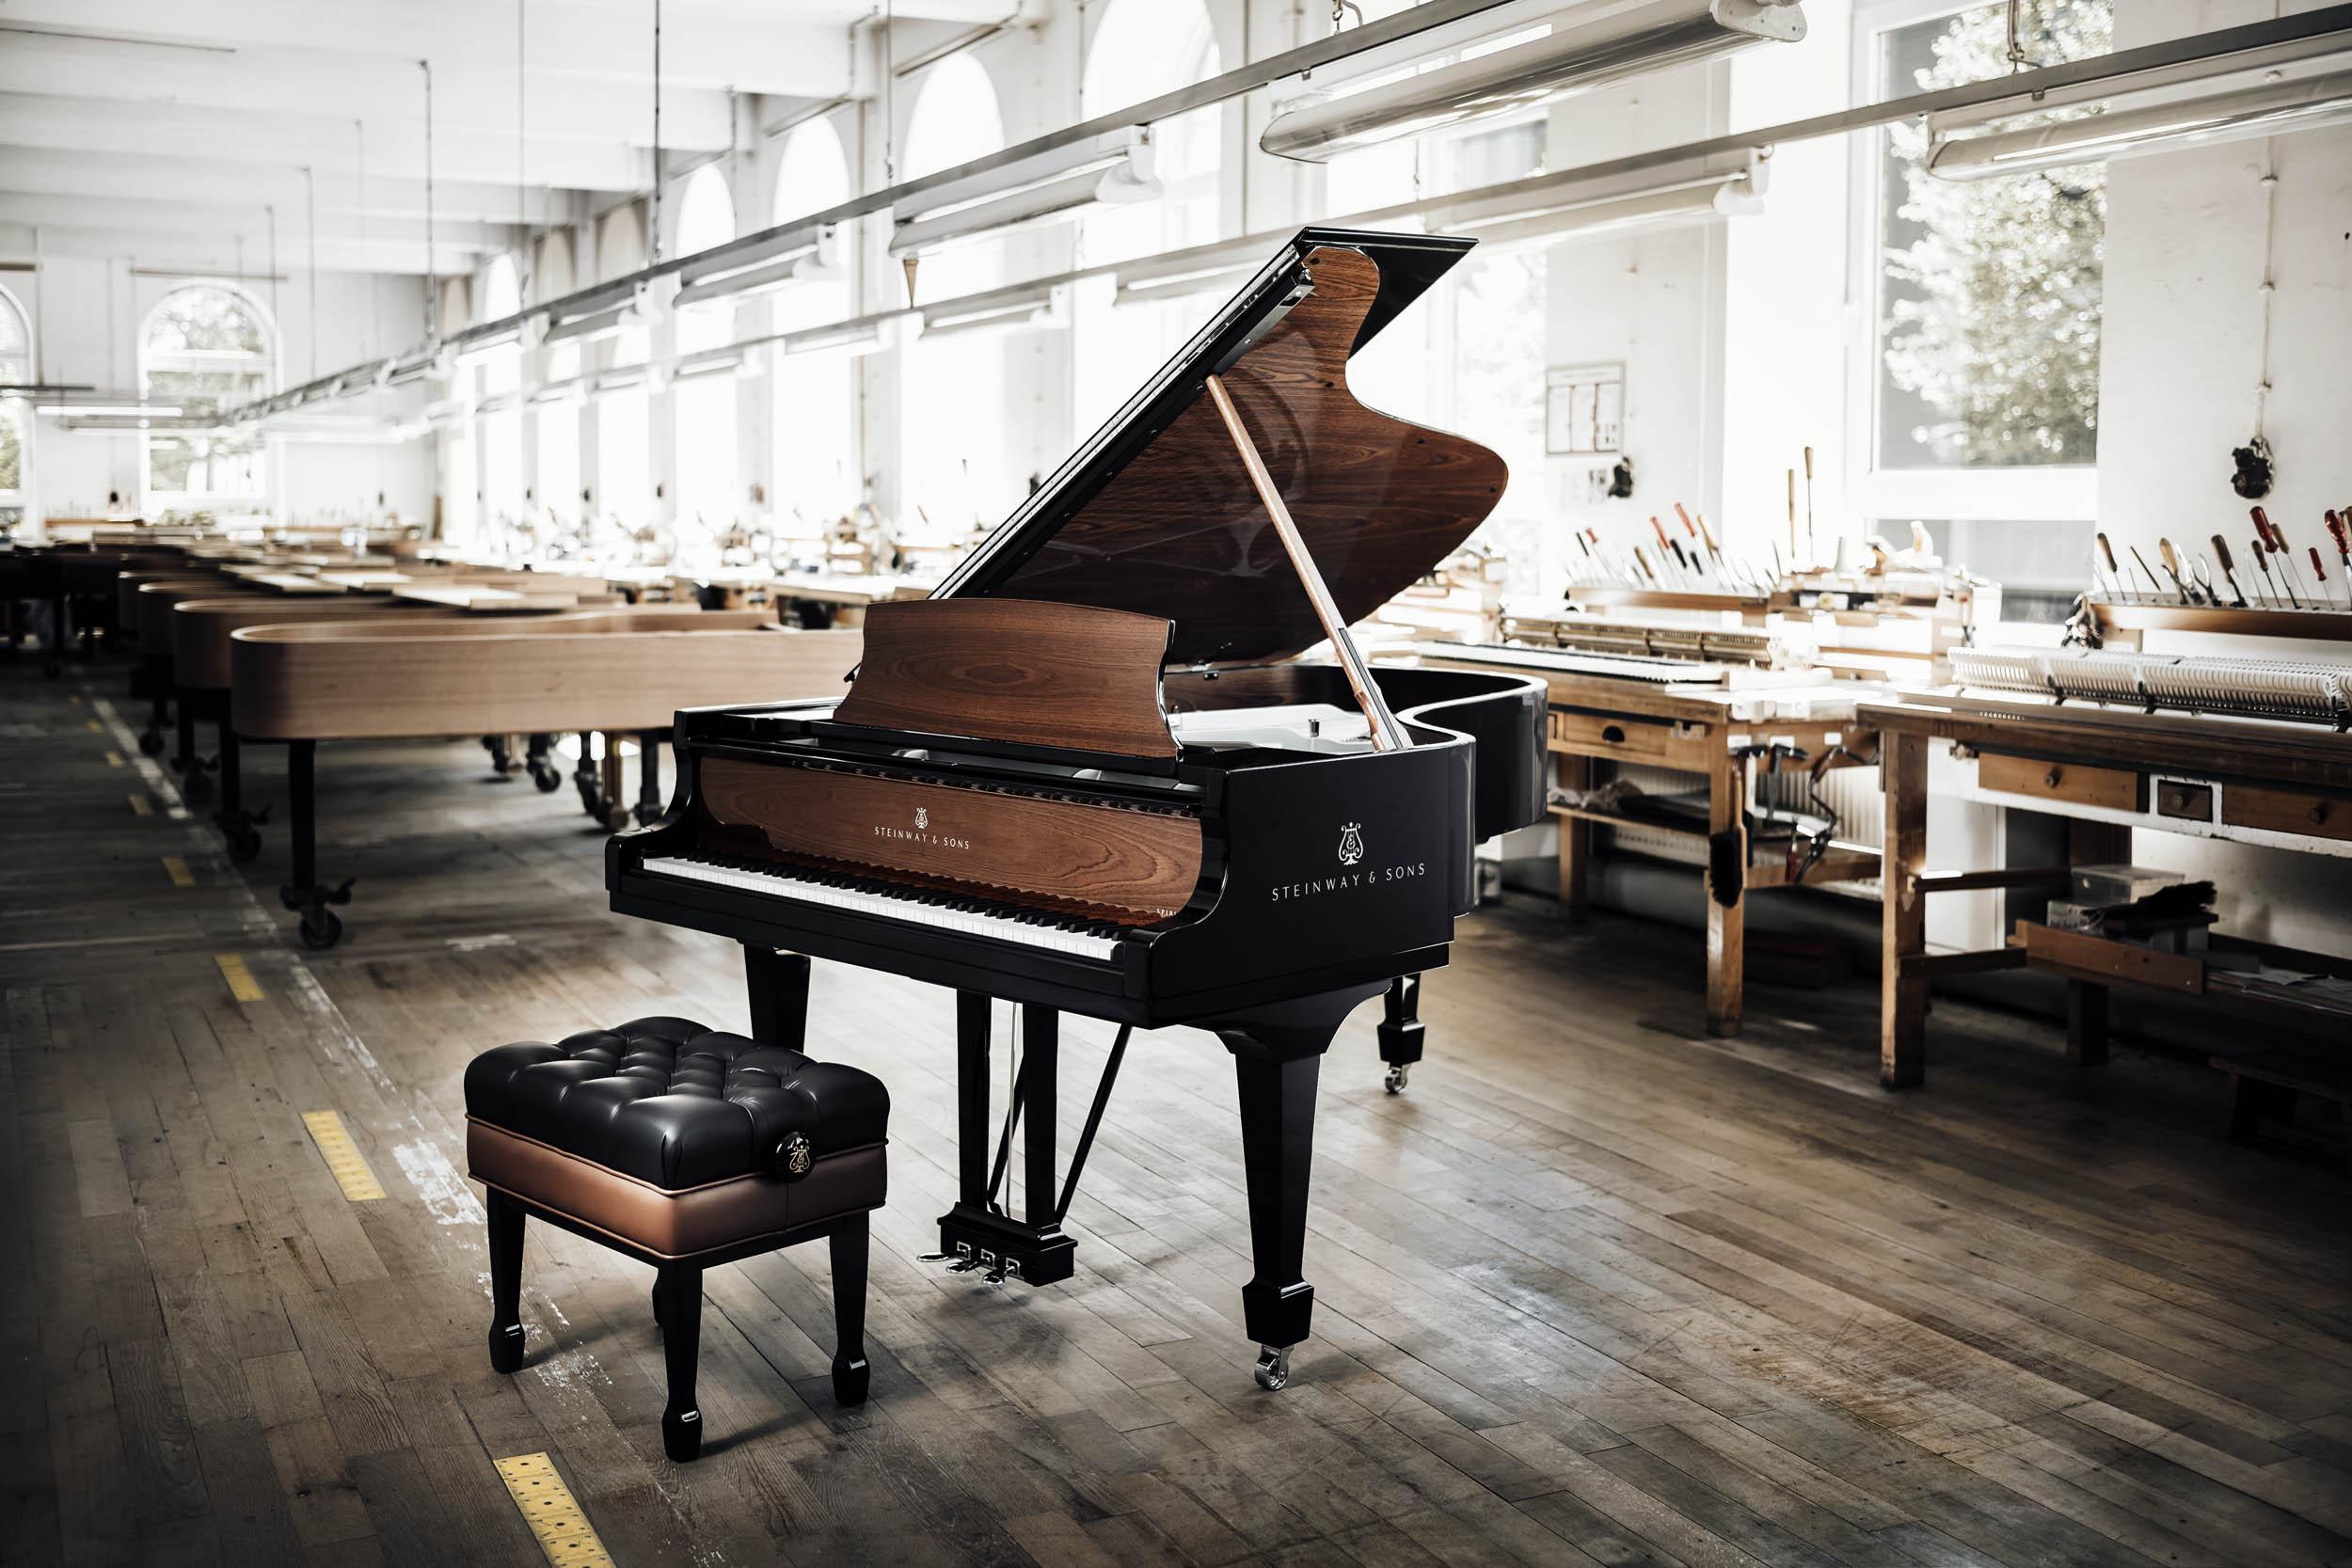 2019-SeifertUebler-steinway-piano-009.jpg